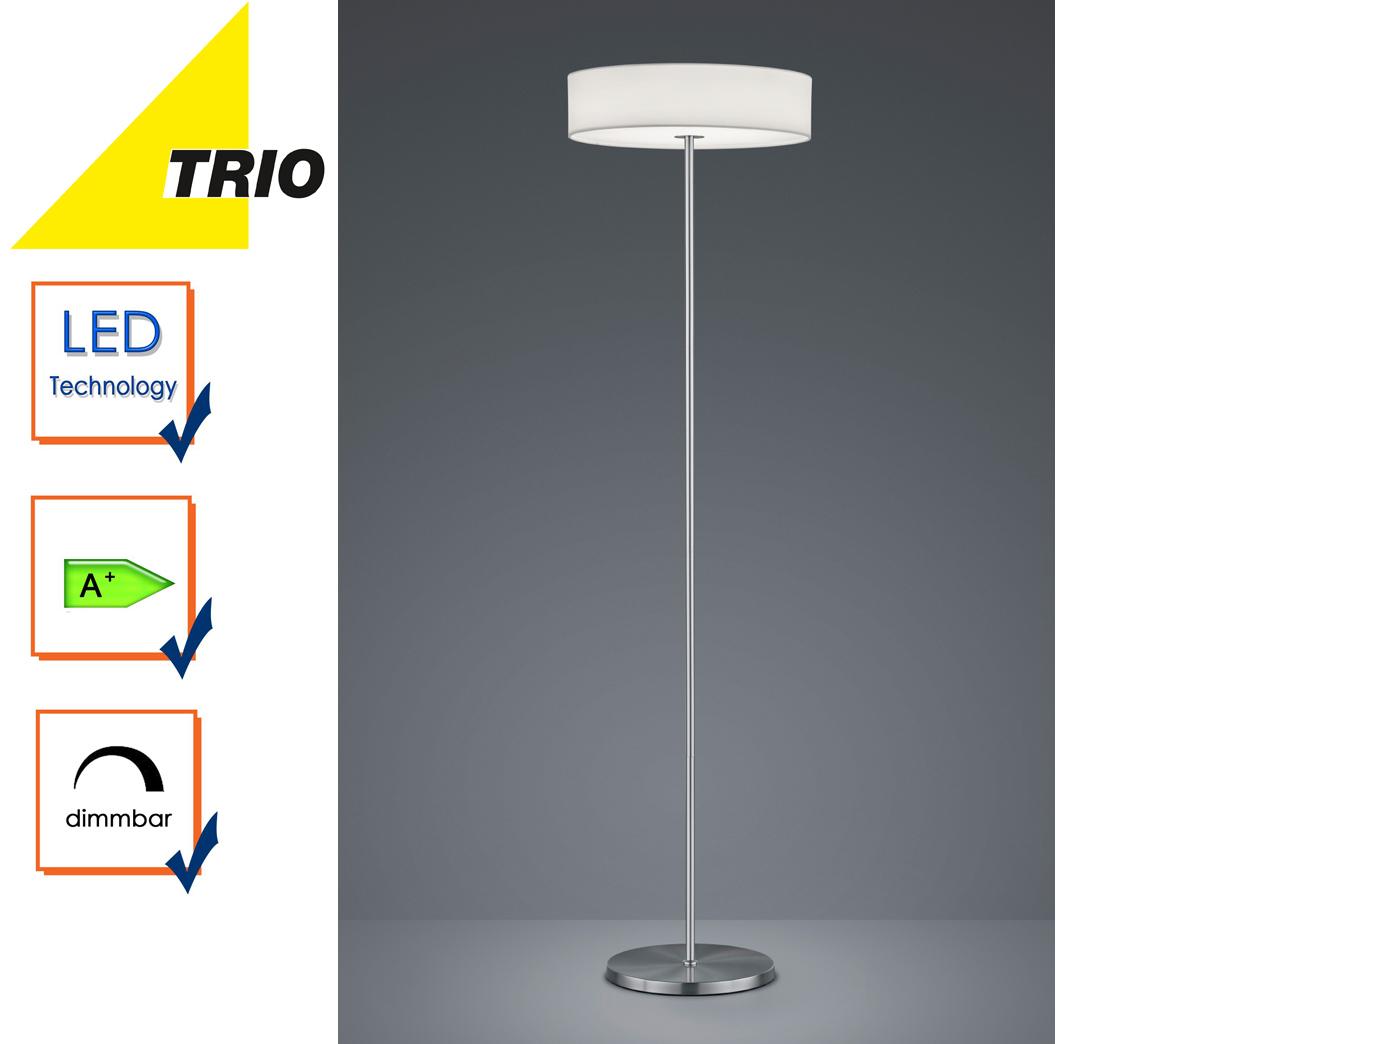 Trio led design stehlampe lugano dimmbar stoffschirm weiß